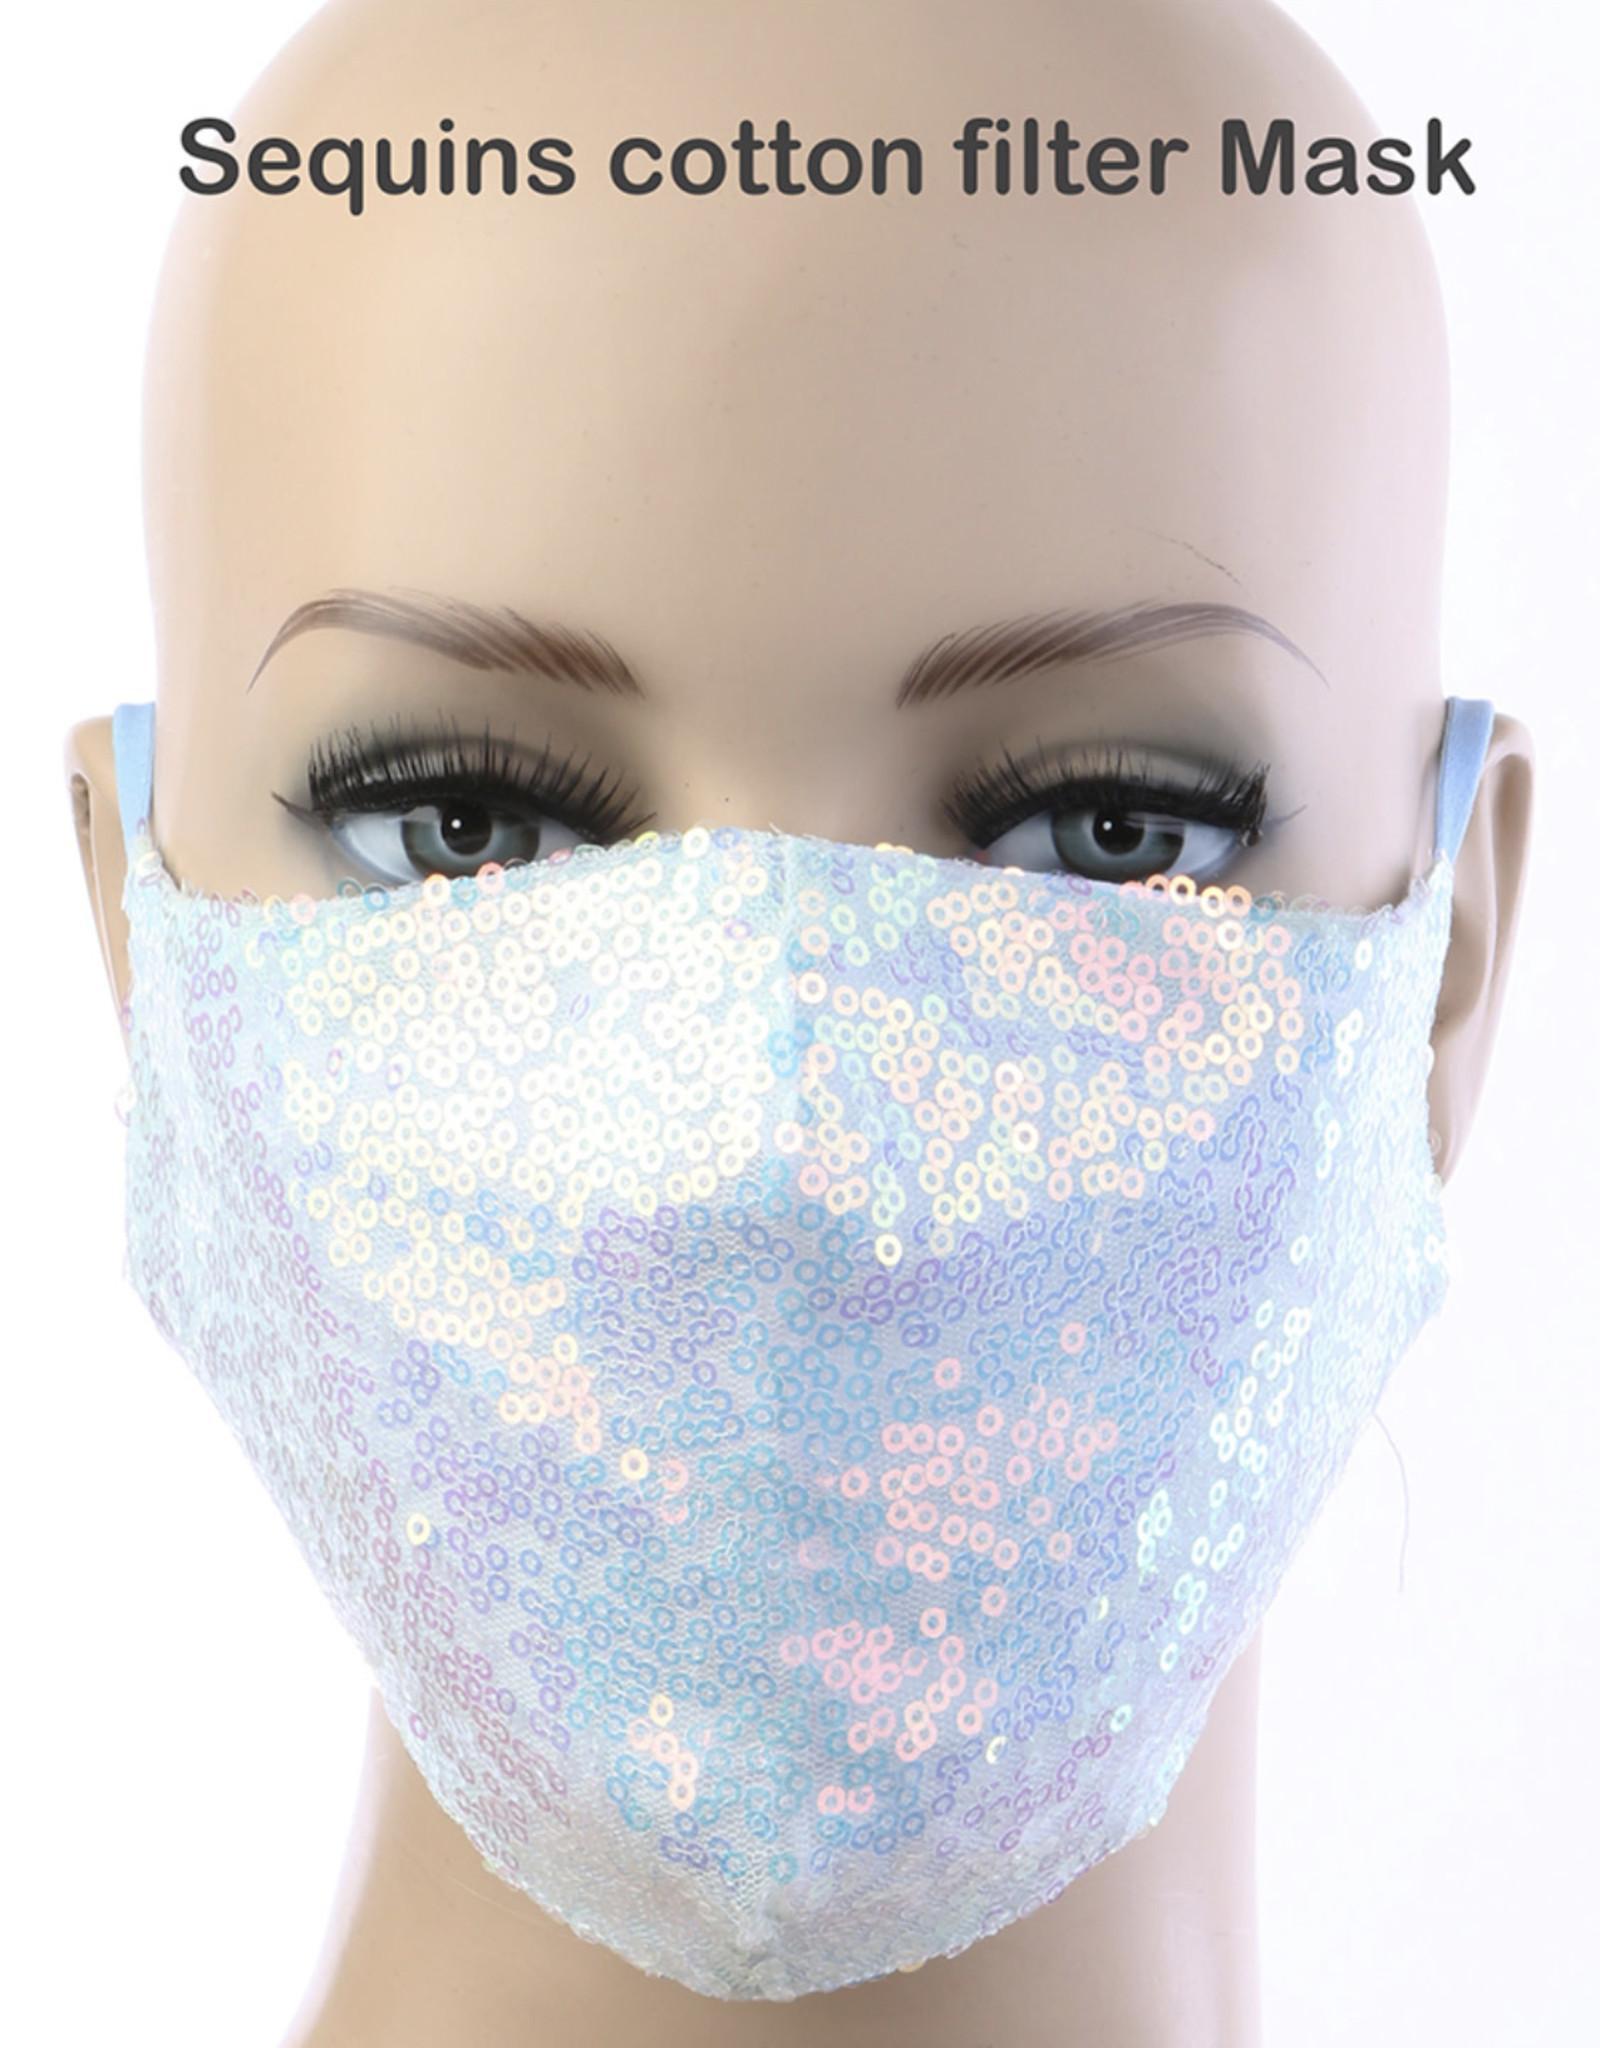 FACE MASK CLOTH W/ FILTER POCKET SEQUIN ADJUSTABLE REUSABLE WHITE MULTI HANDWASH